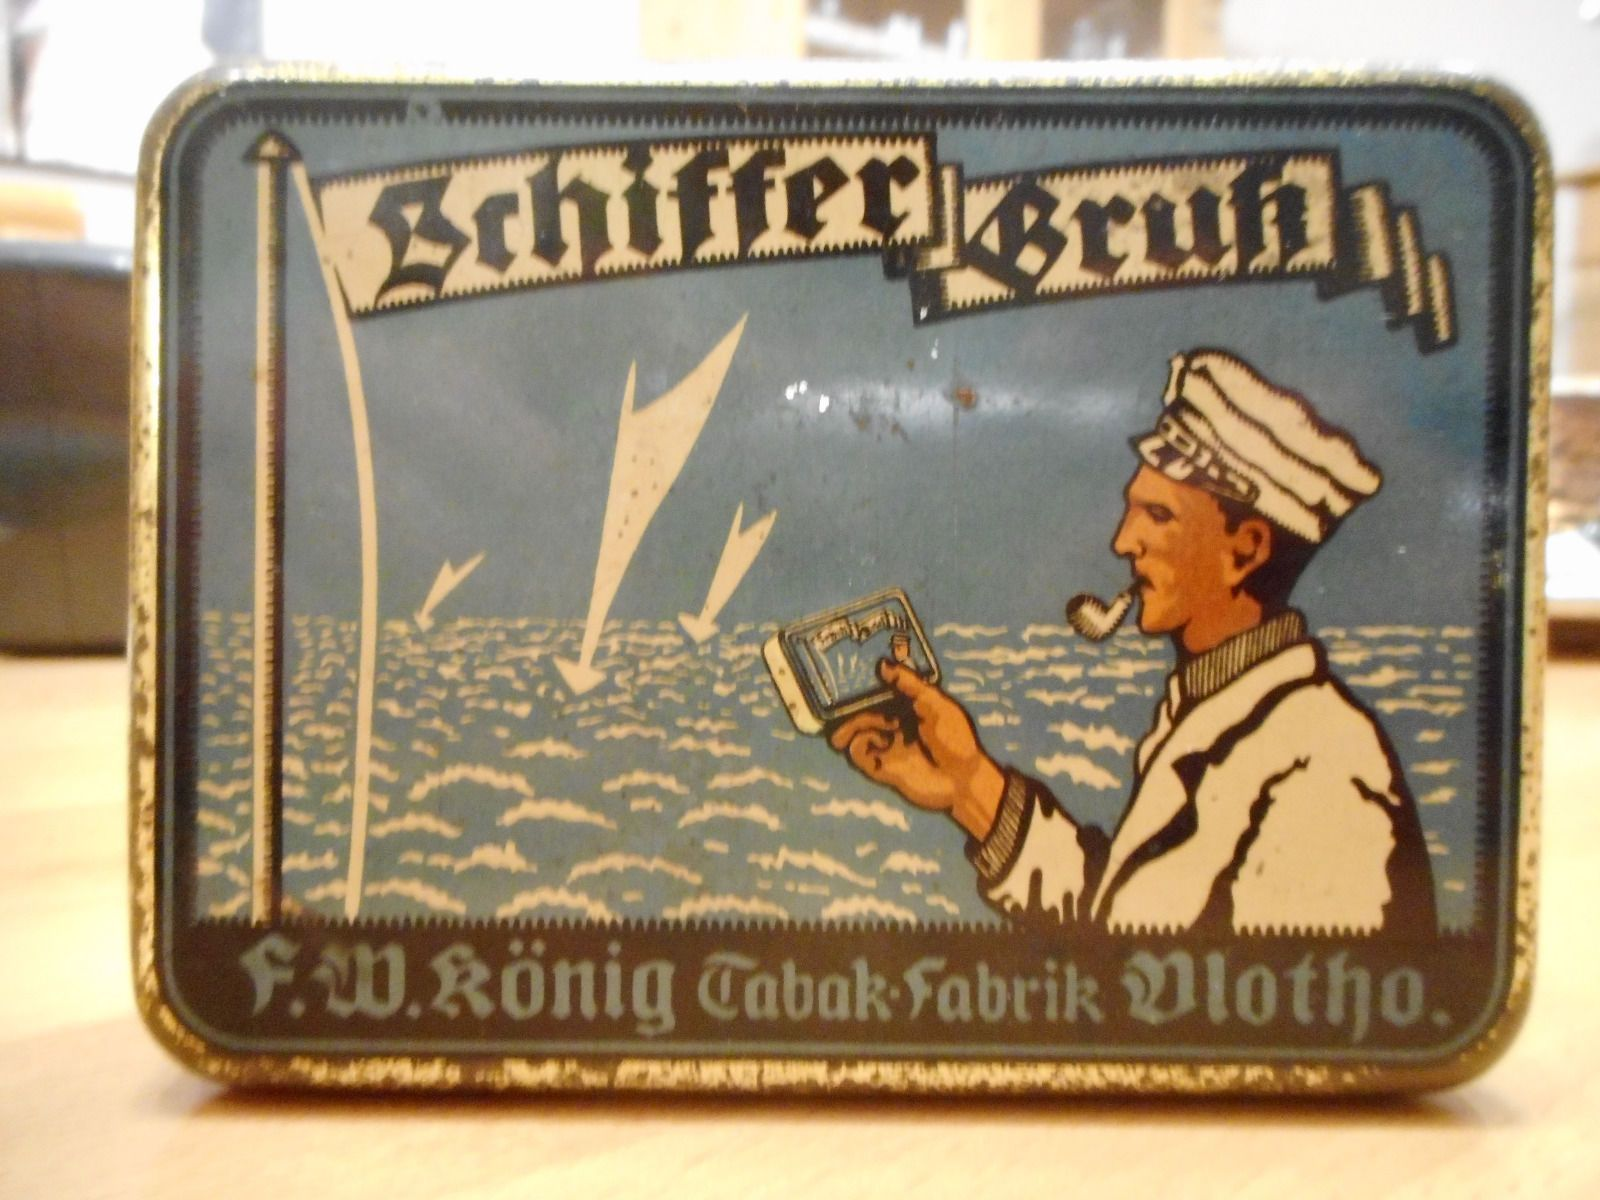 Retro Tabak Keukens : Old german tobacco tin mit maritime look from f.w. könig tabak